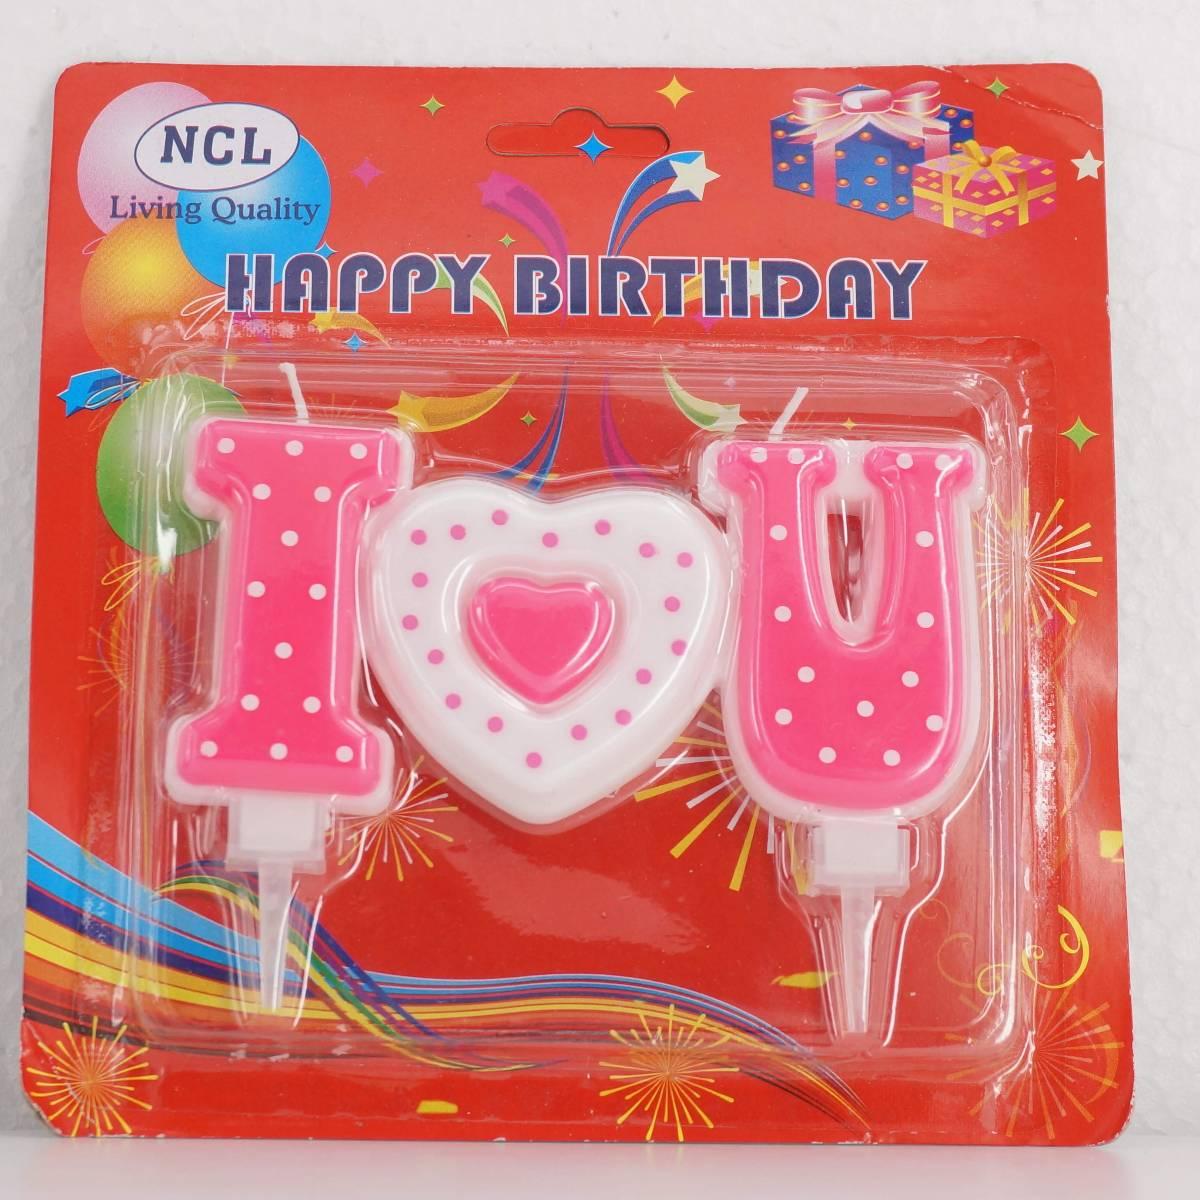 Lilin Ultah / Lilin Ulang Tahun Motif Love / I Love U